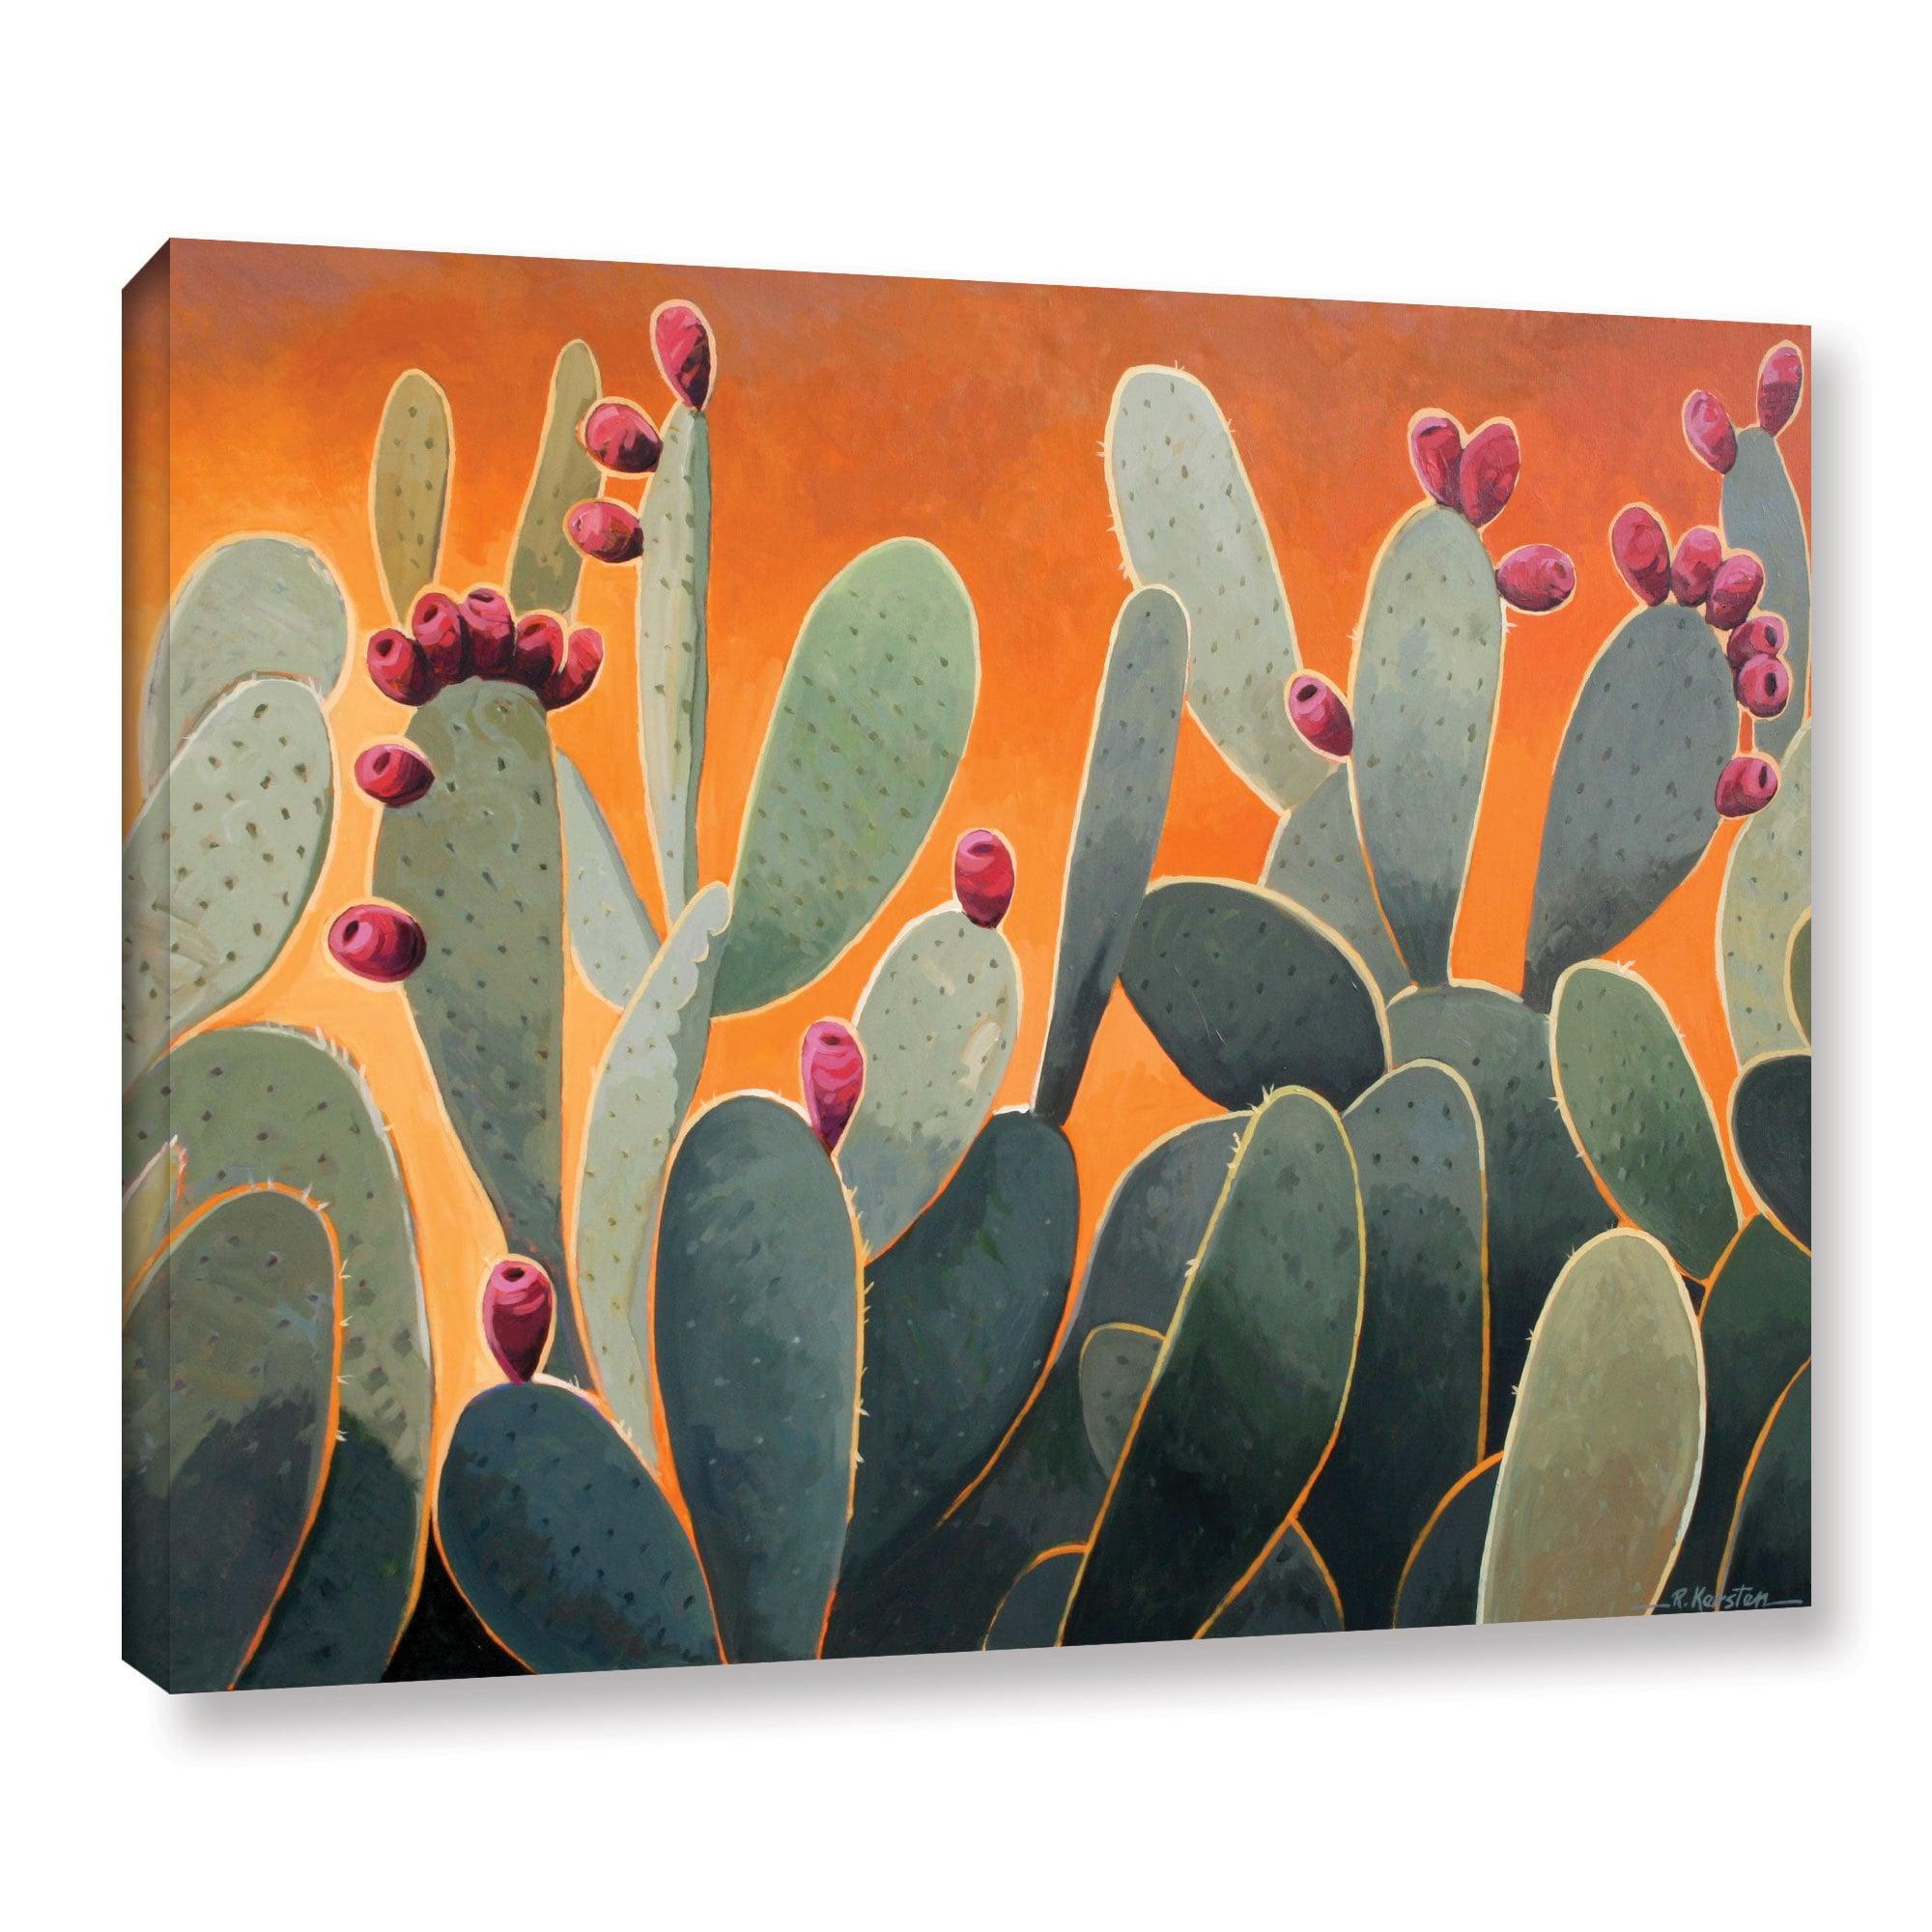 Geometric Nopales Cactus Art Painting Psycadelic